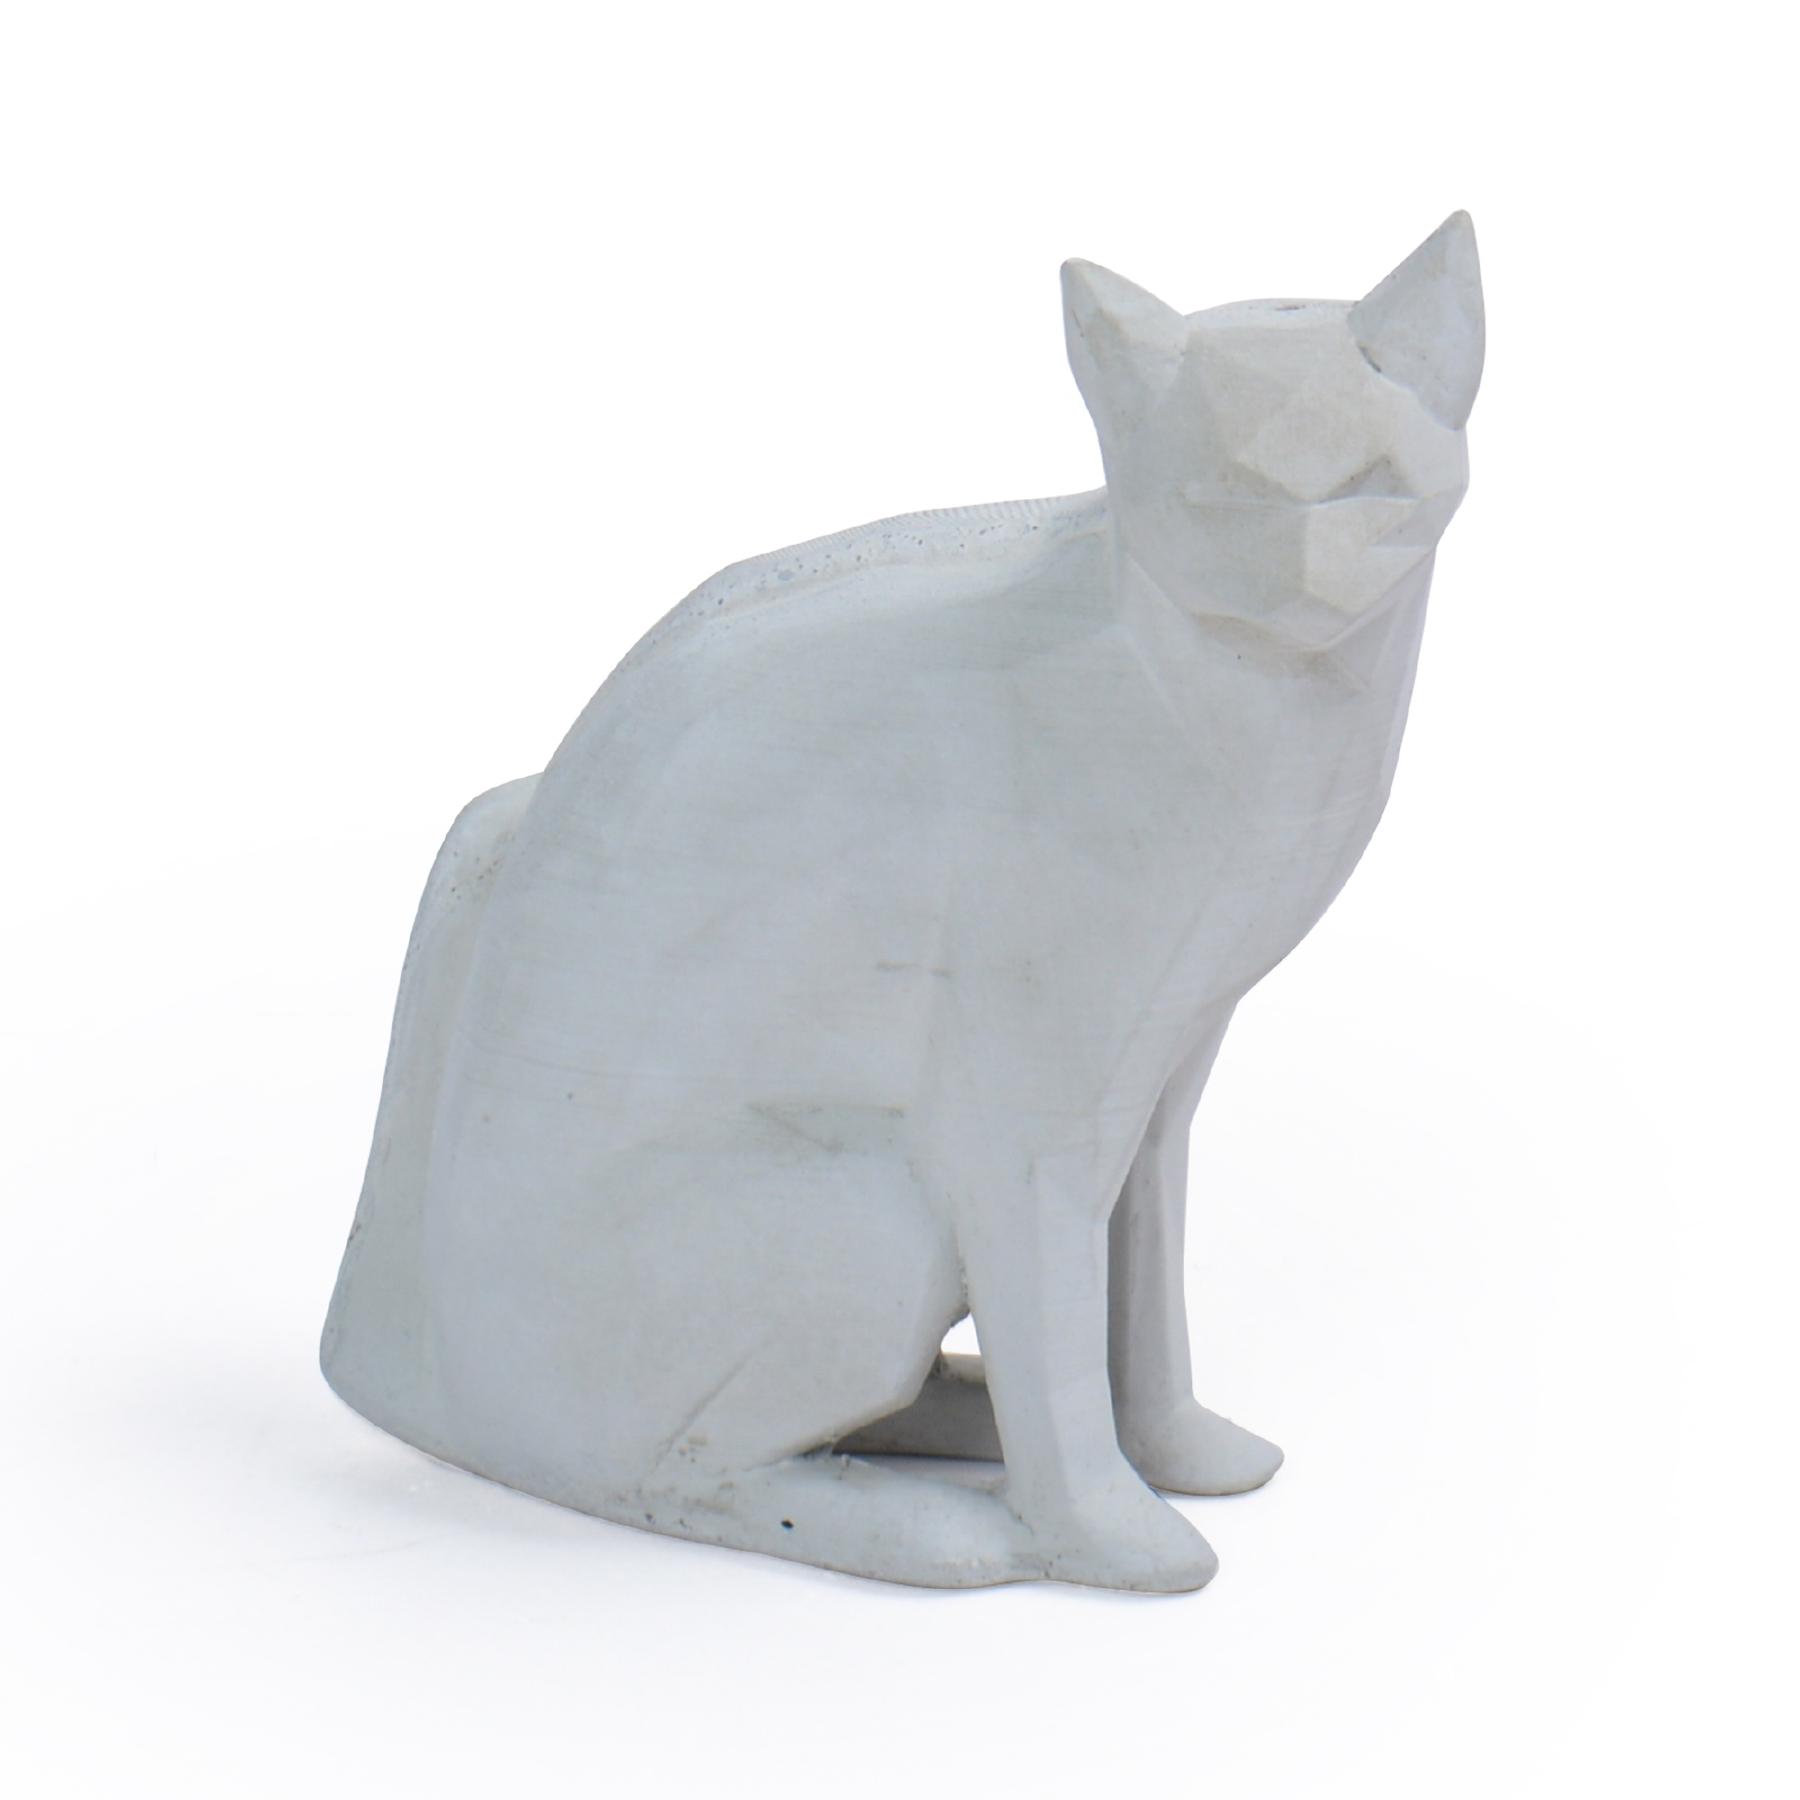 Escultura Gato geométrico de Concreto